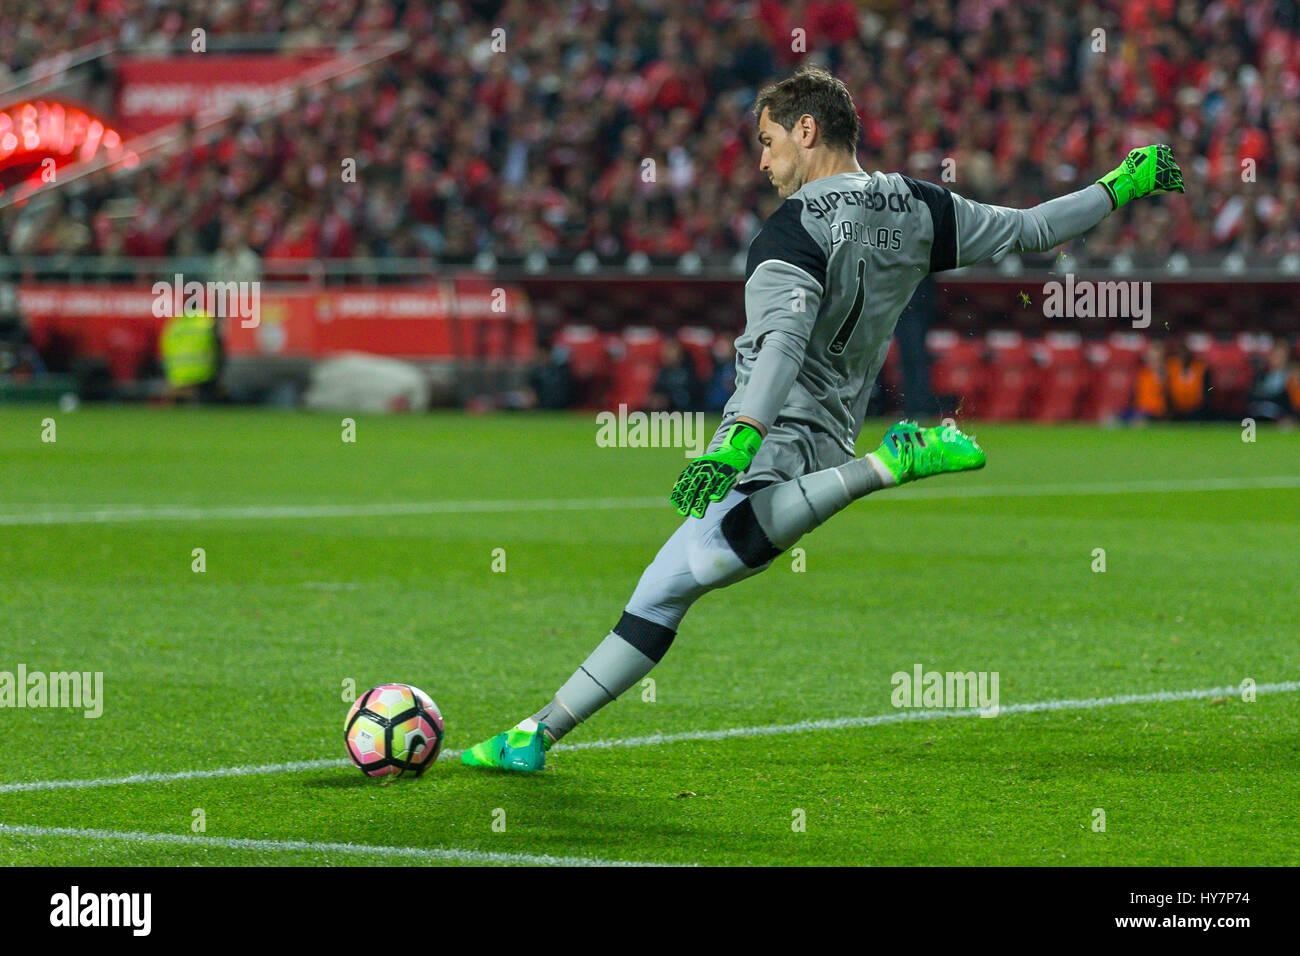 Iker Casillas Stock Photos & Iker Casillas Stock Images ...